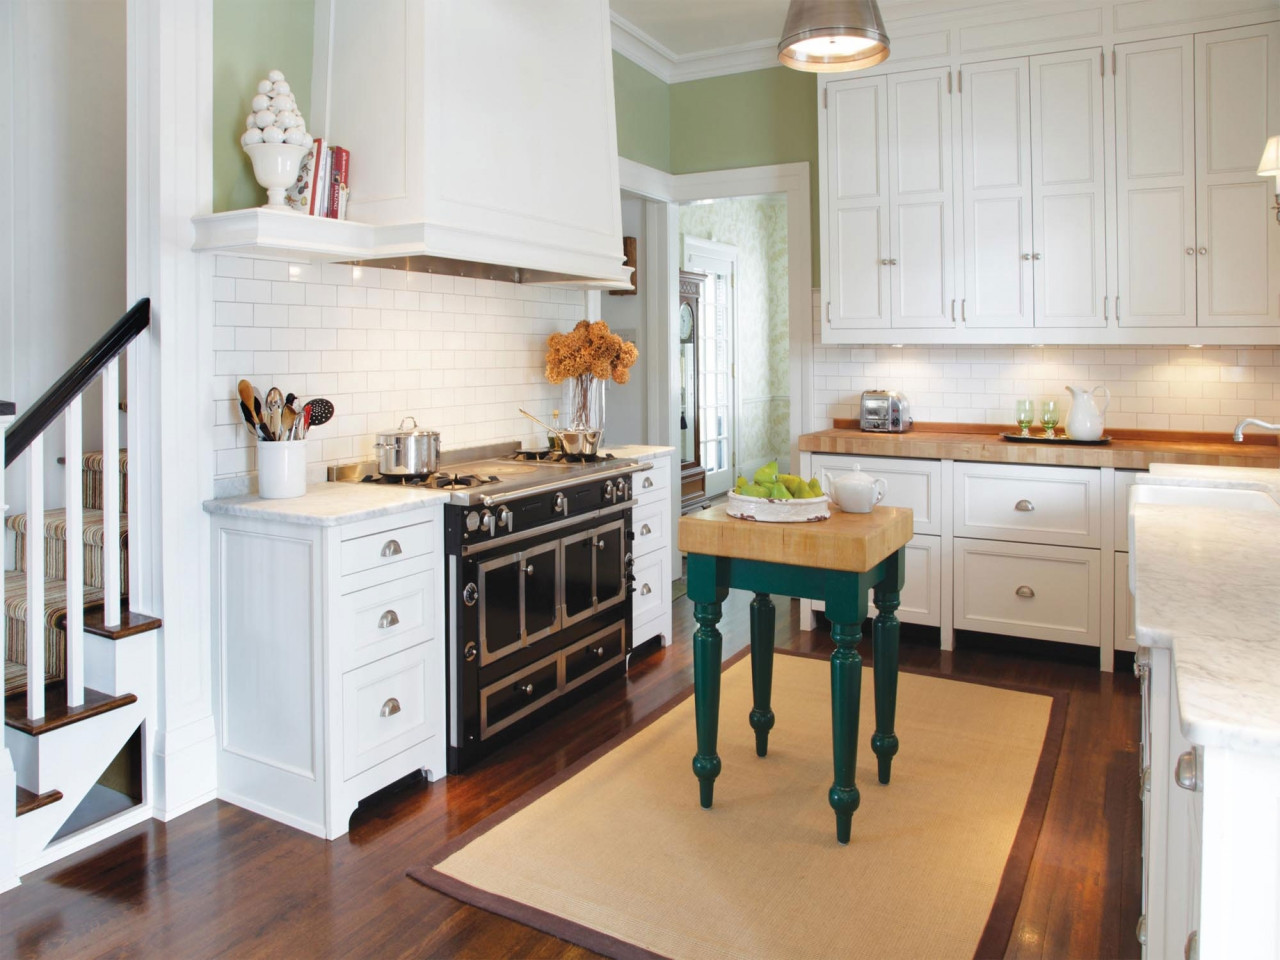 Menards Kitchen Design  Menard paint colors menards kitchen base cabinets menards